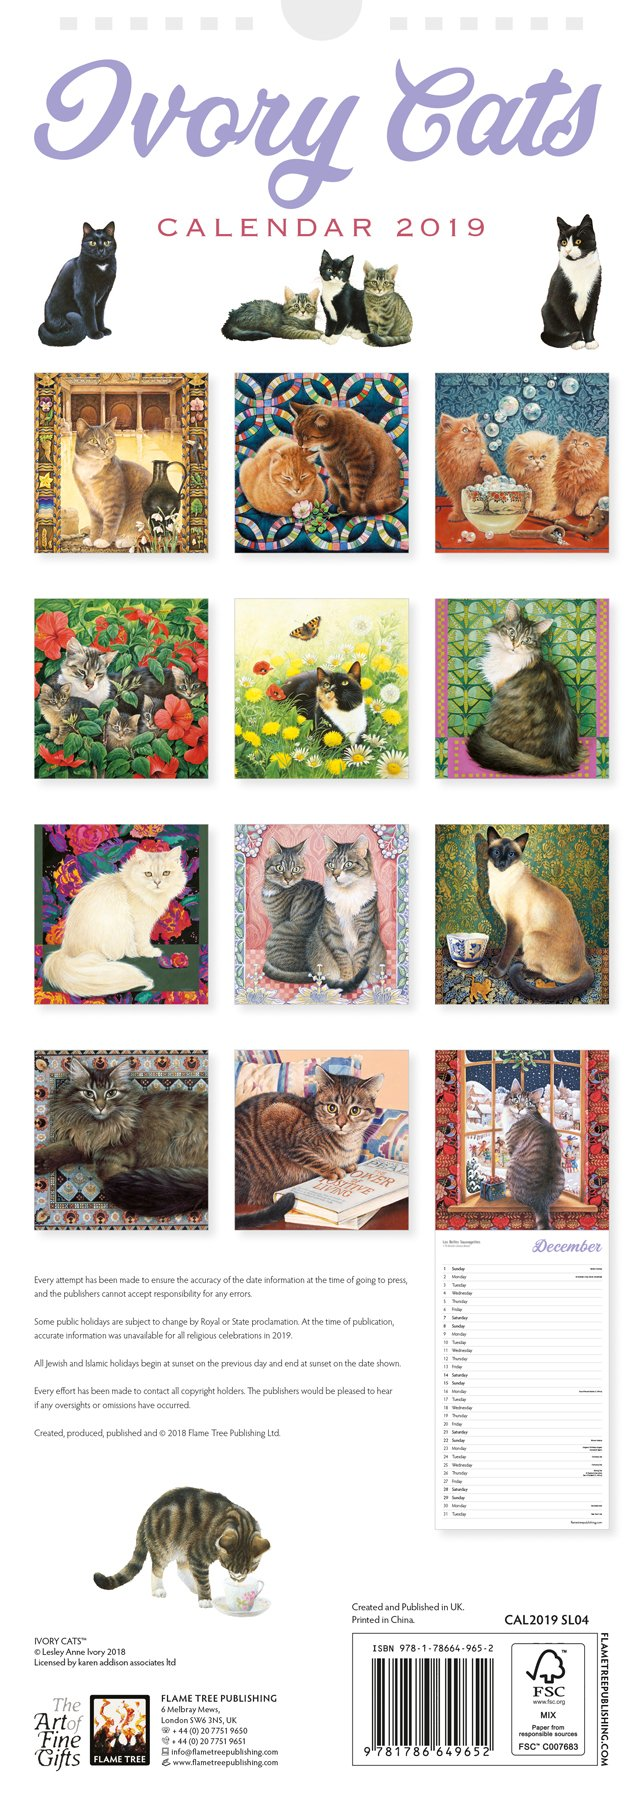 dce39aaf947 Ivory Cats slim calendar 2019 (Art Calendar)  Amazon.co.uk  Flame Tree  Studio  9781786649652  Books